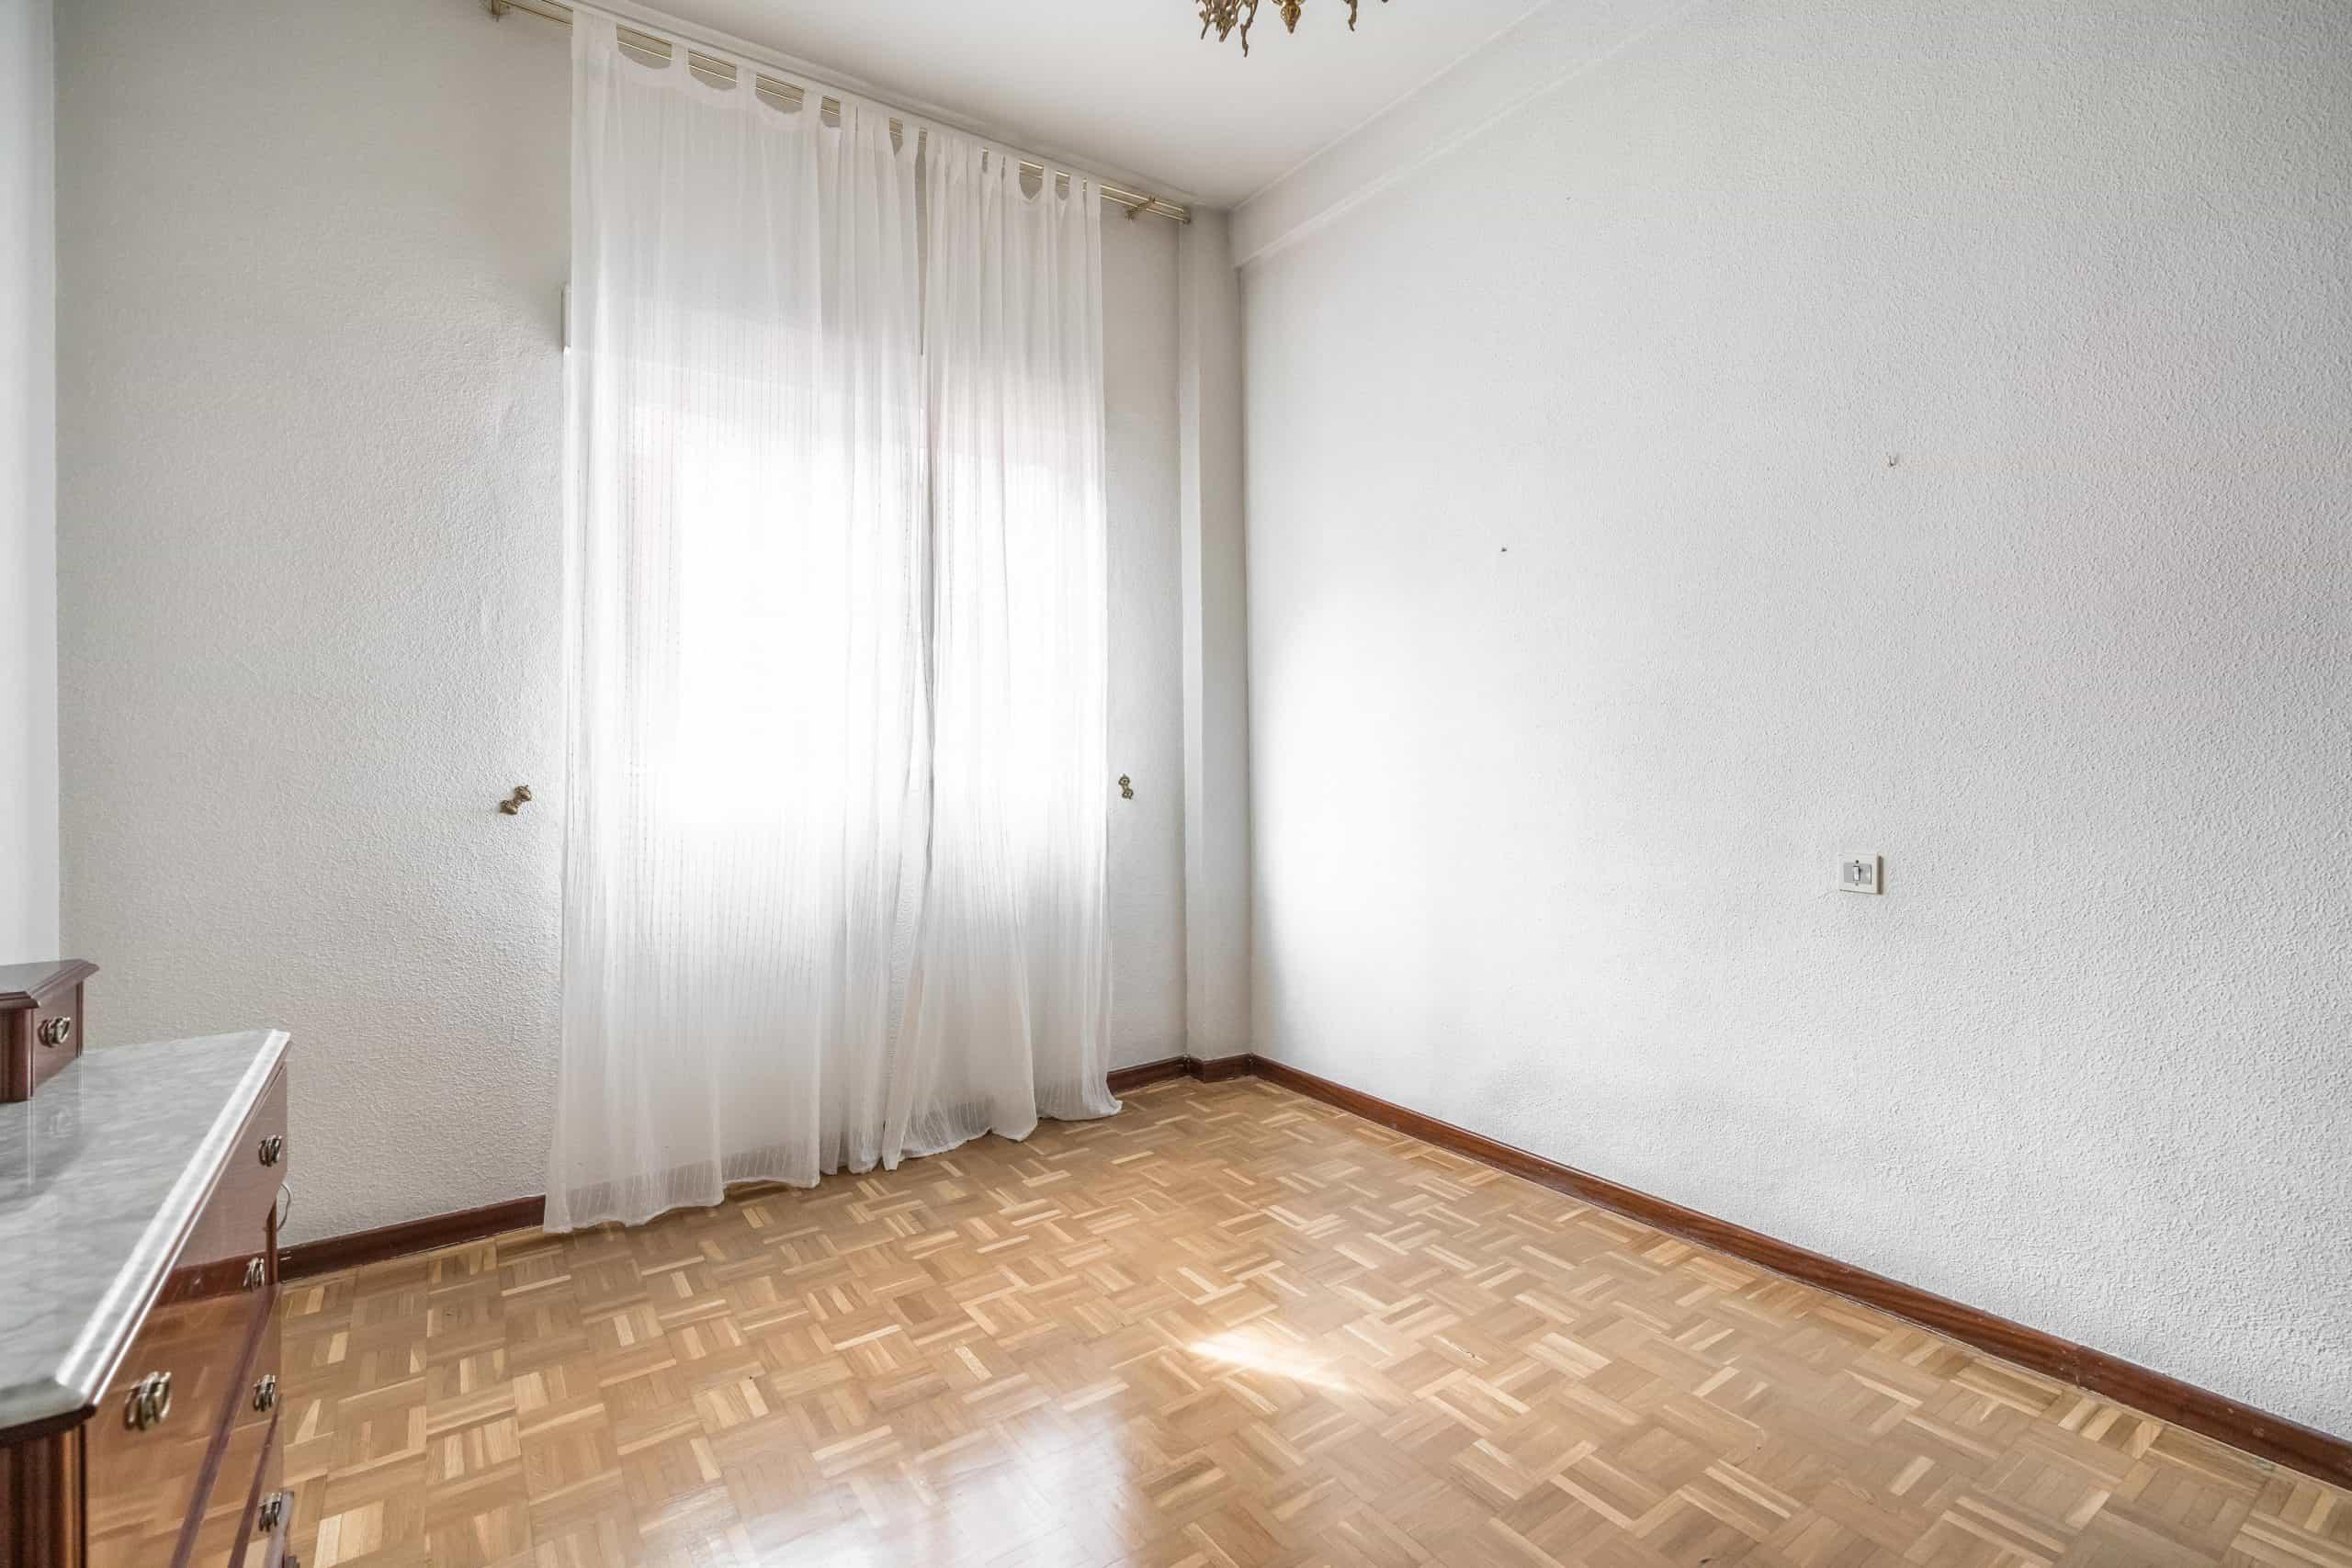 Agencia Inmobiliaria de Madrid-FUTUROCASA-Zona ARGANZUELA-LEGAZPI -calle Jaime Conquistador 48- 1er Dormitorio 2